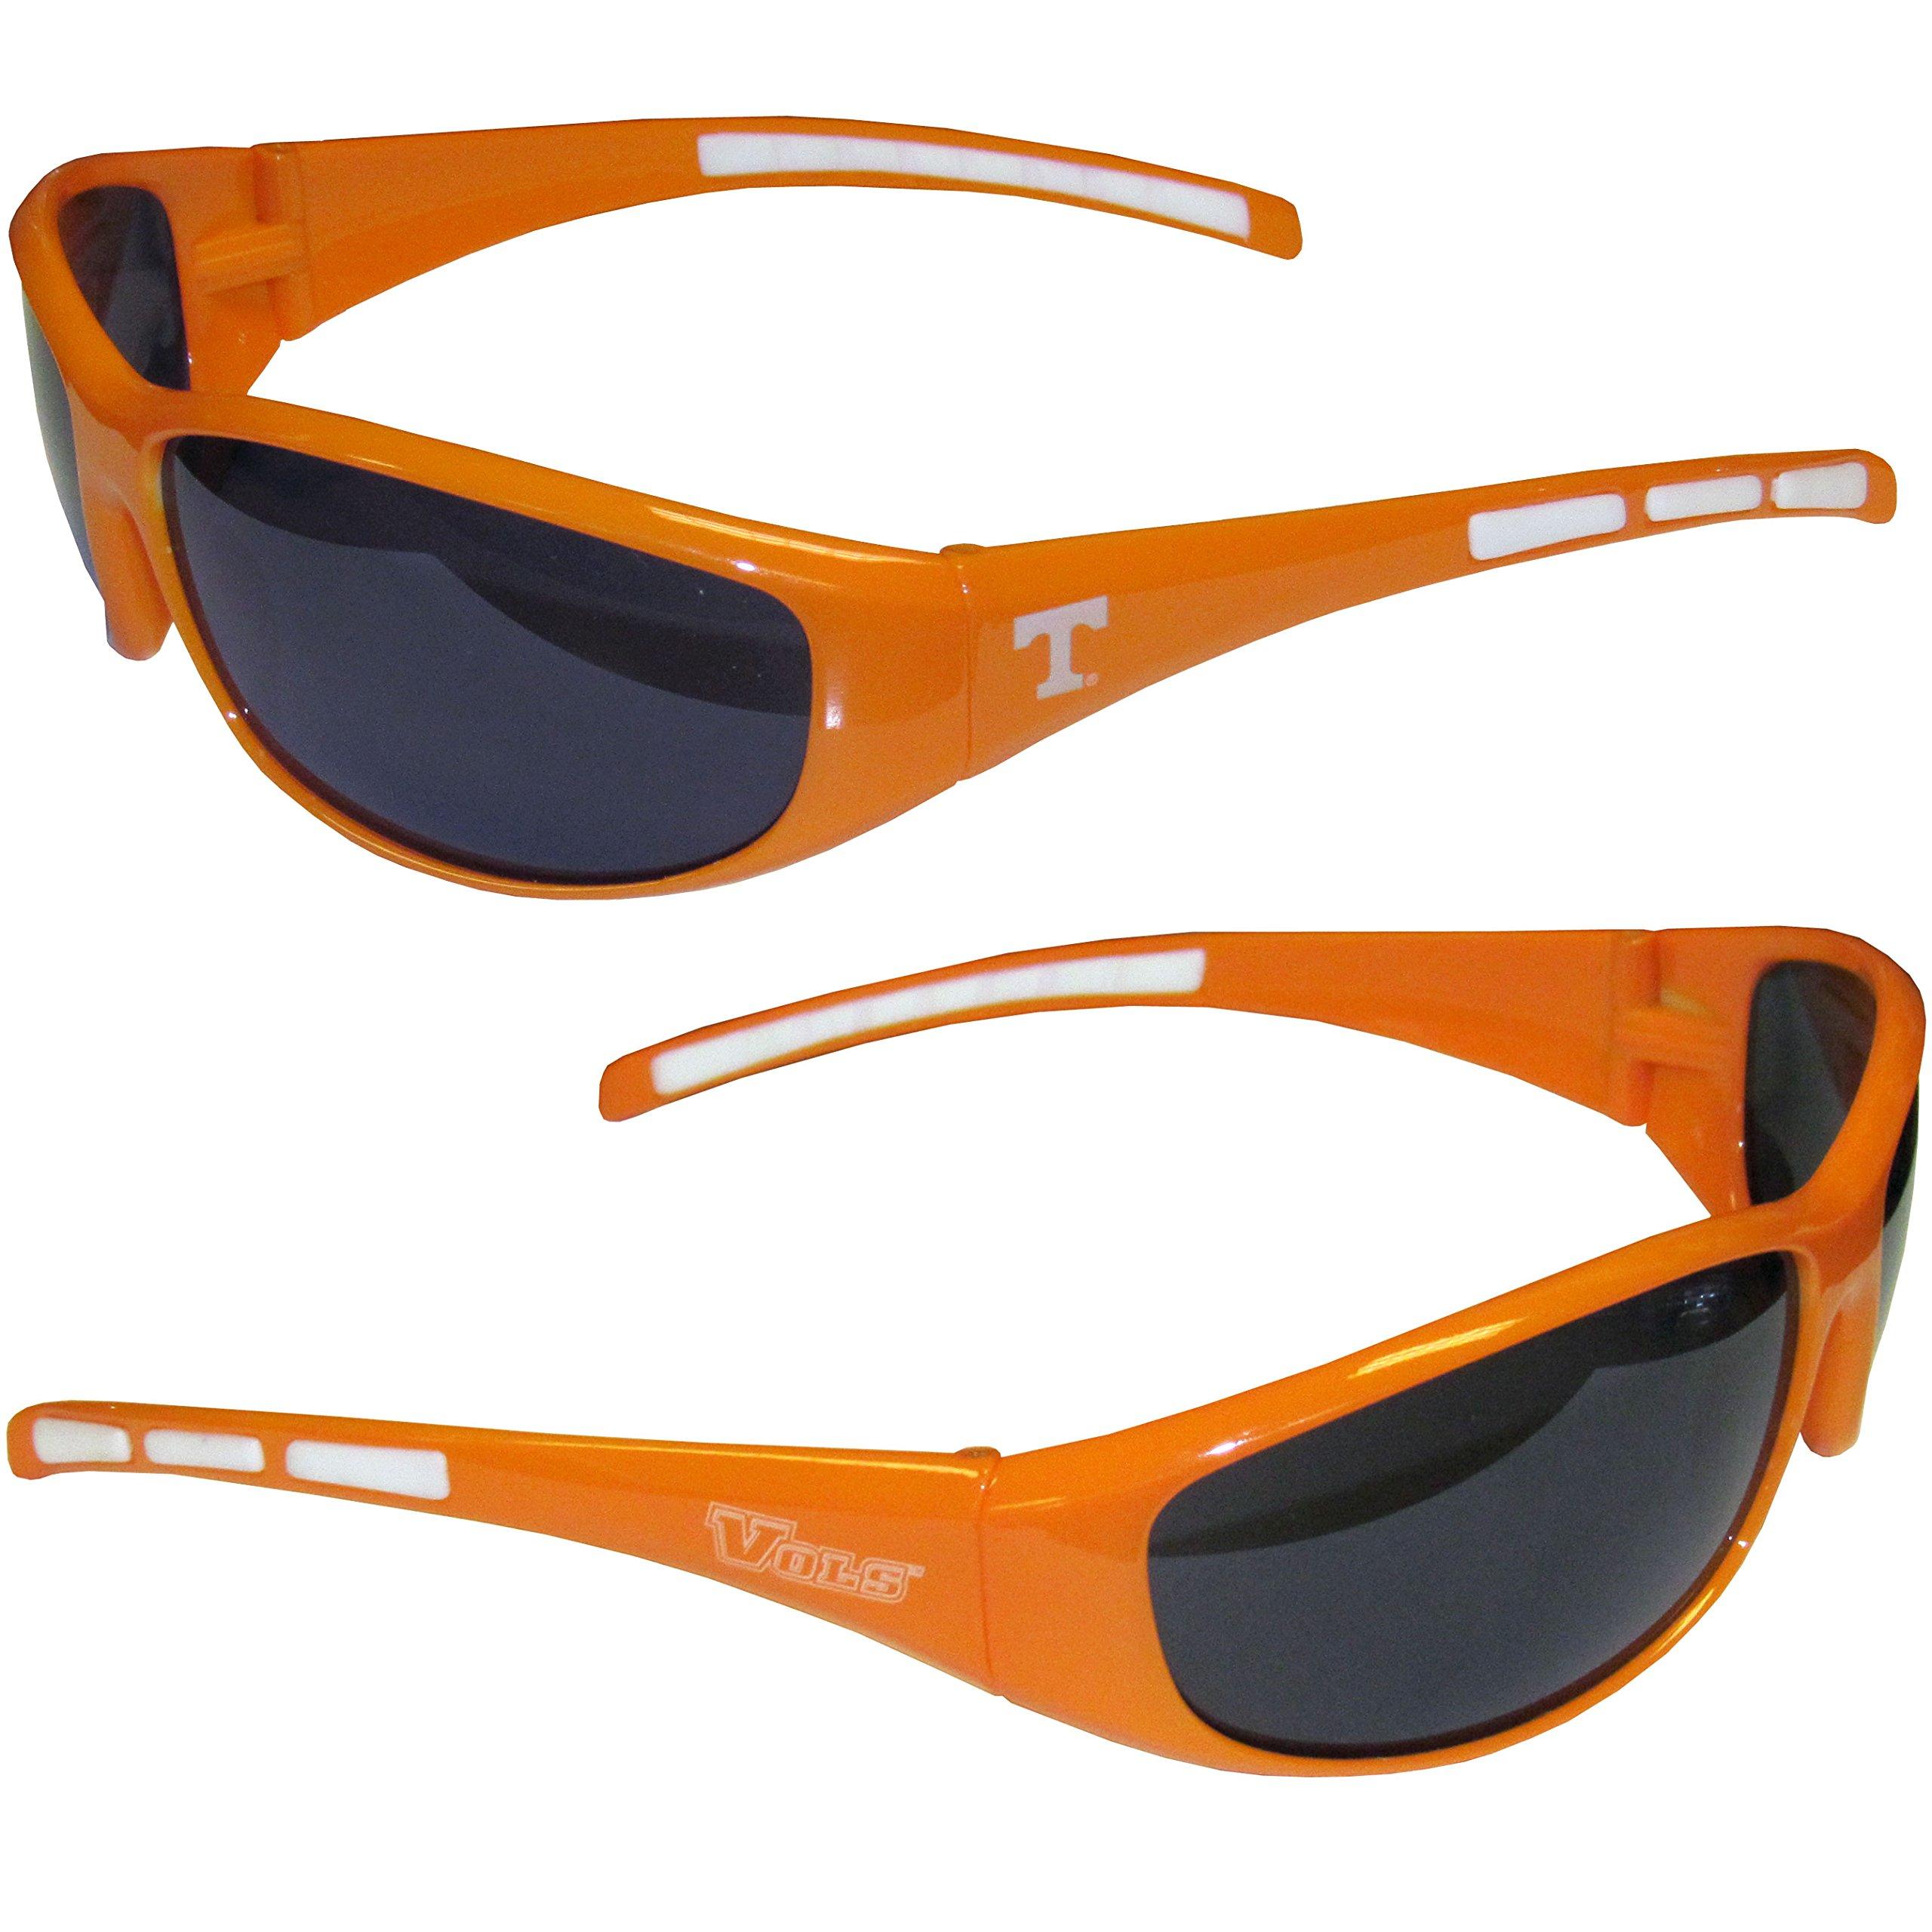 Siskiyou NCAA Tennessee Volunteers Adult Sunglass and Bag Set, Orange by Siskiyou (Image #2)